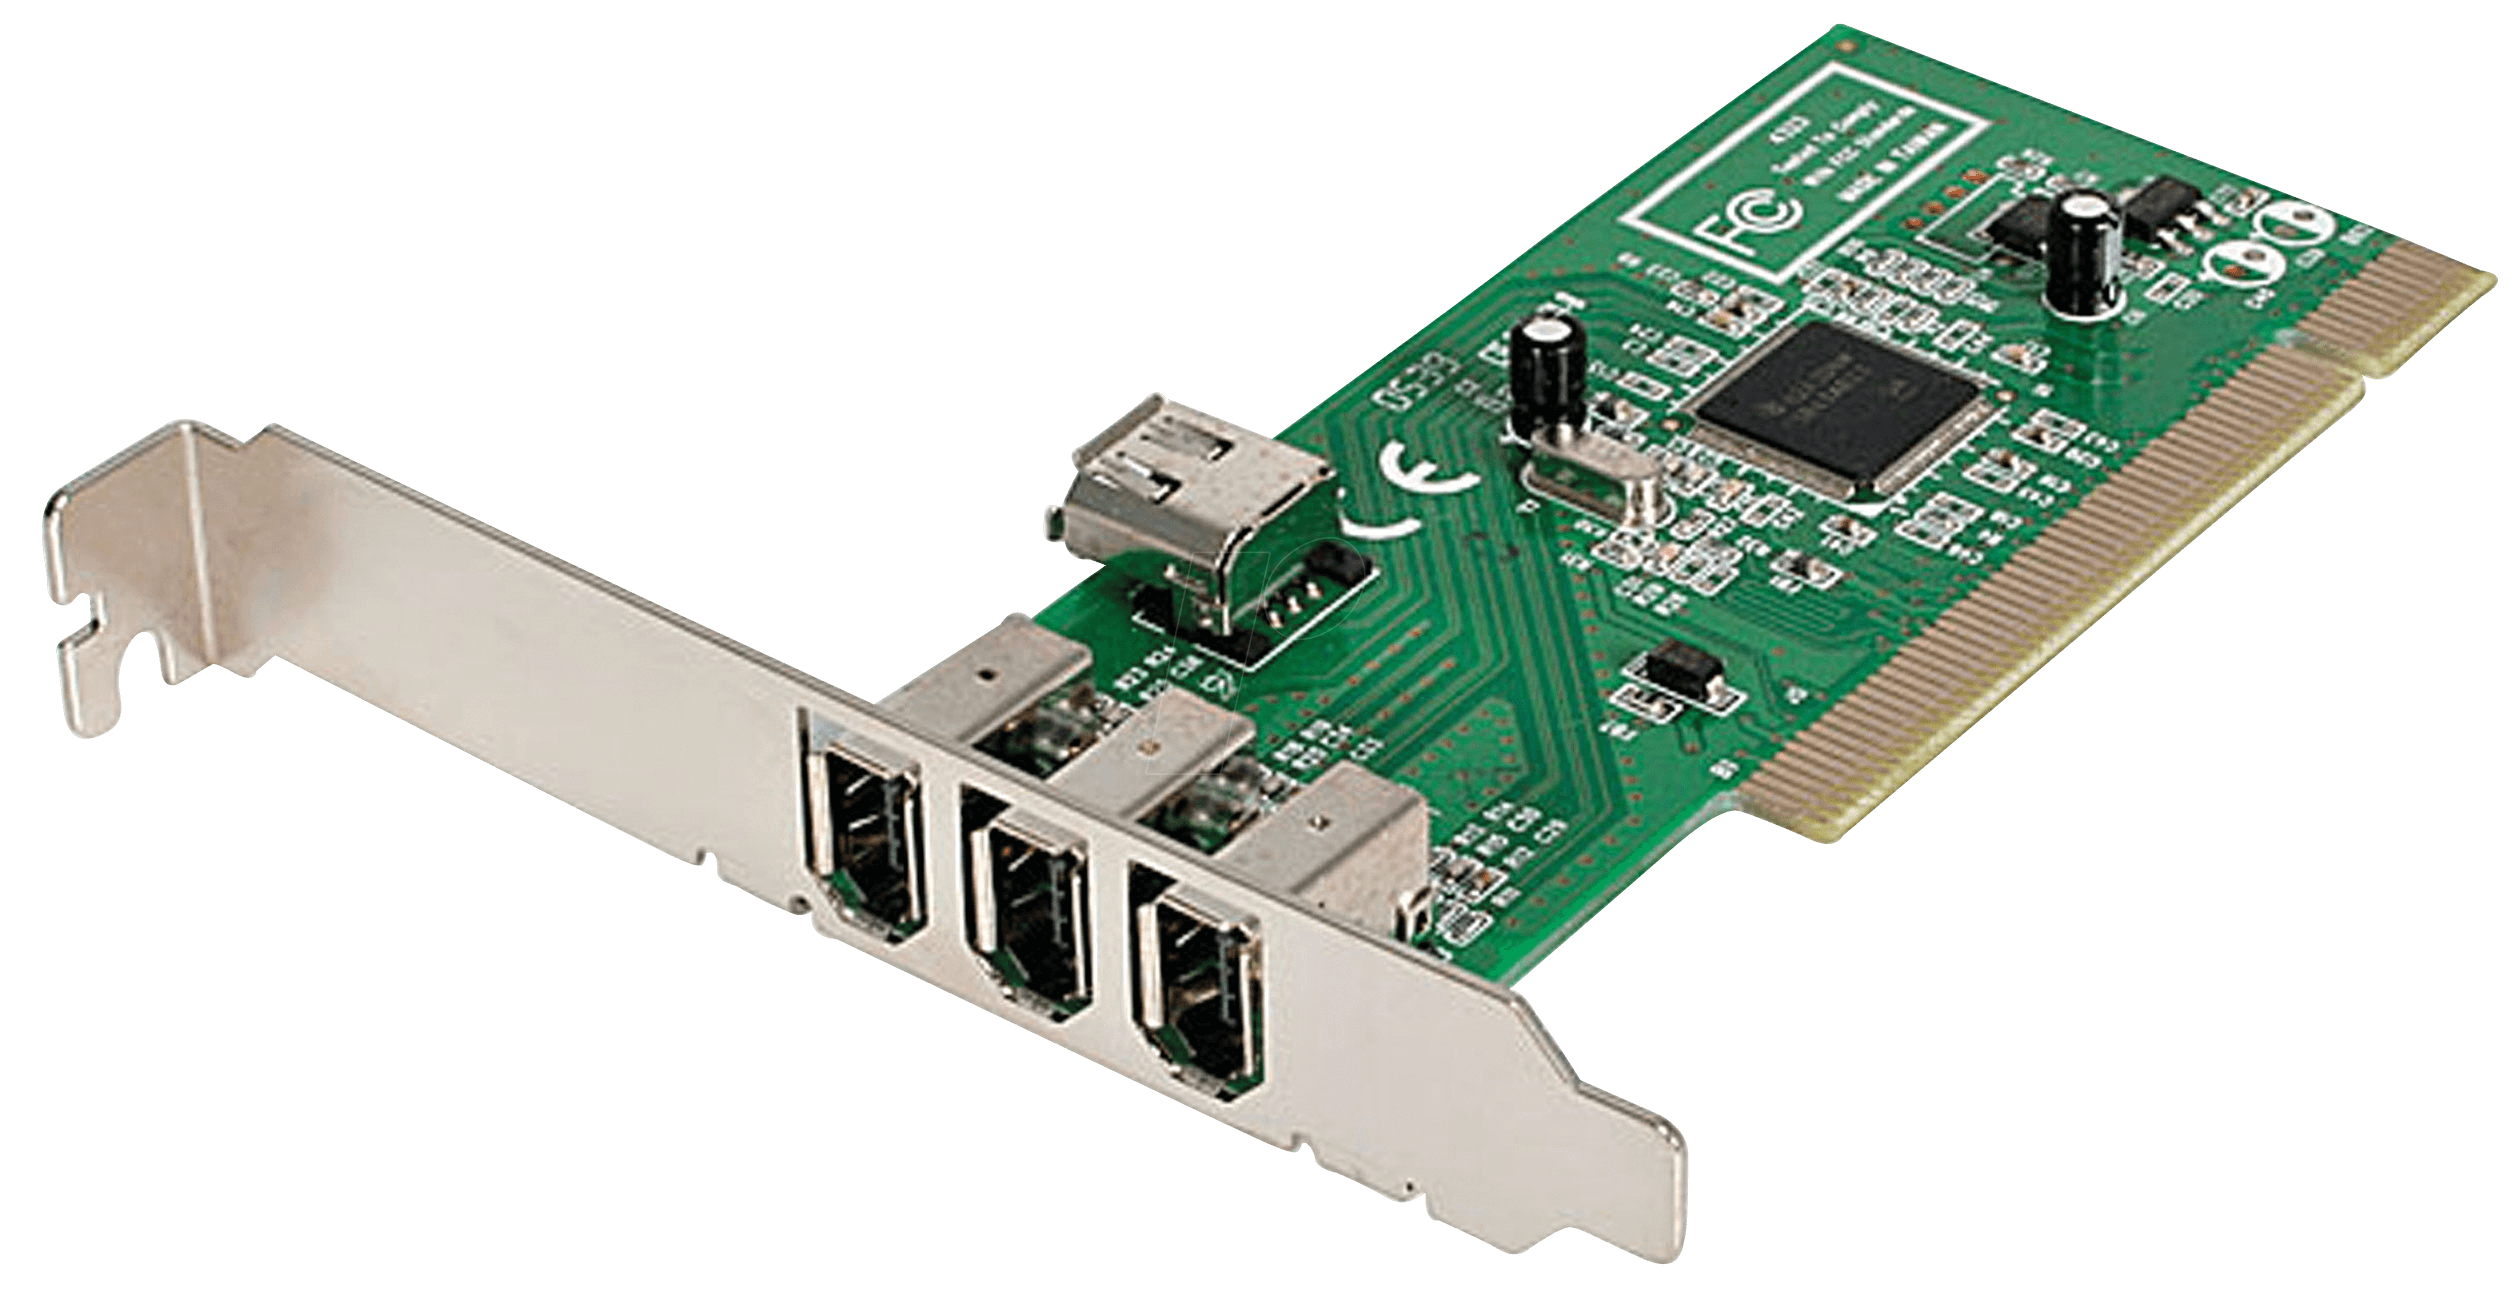 pci karte ST PCI1394MP: PCI Karte 4 Port 1394a Firewire bei reichelt elektronik